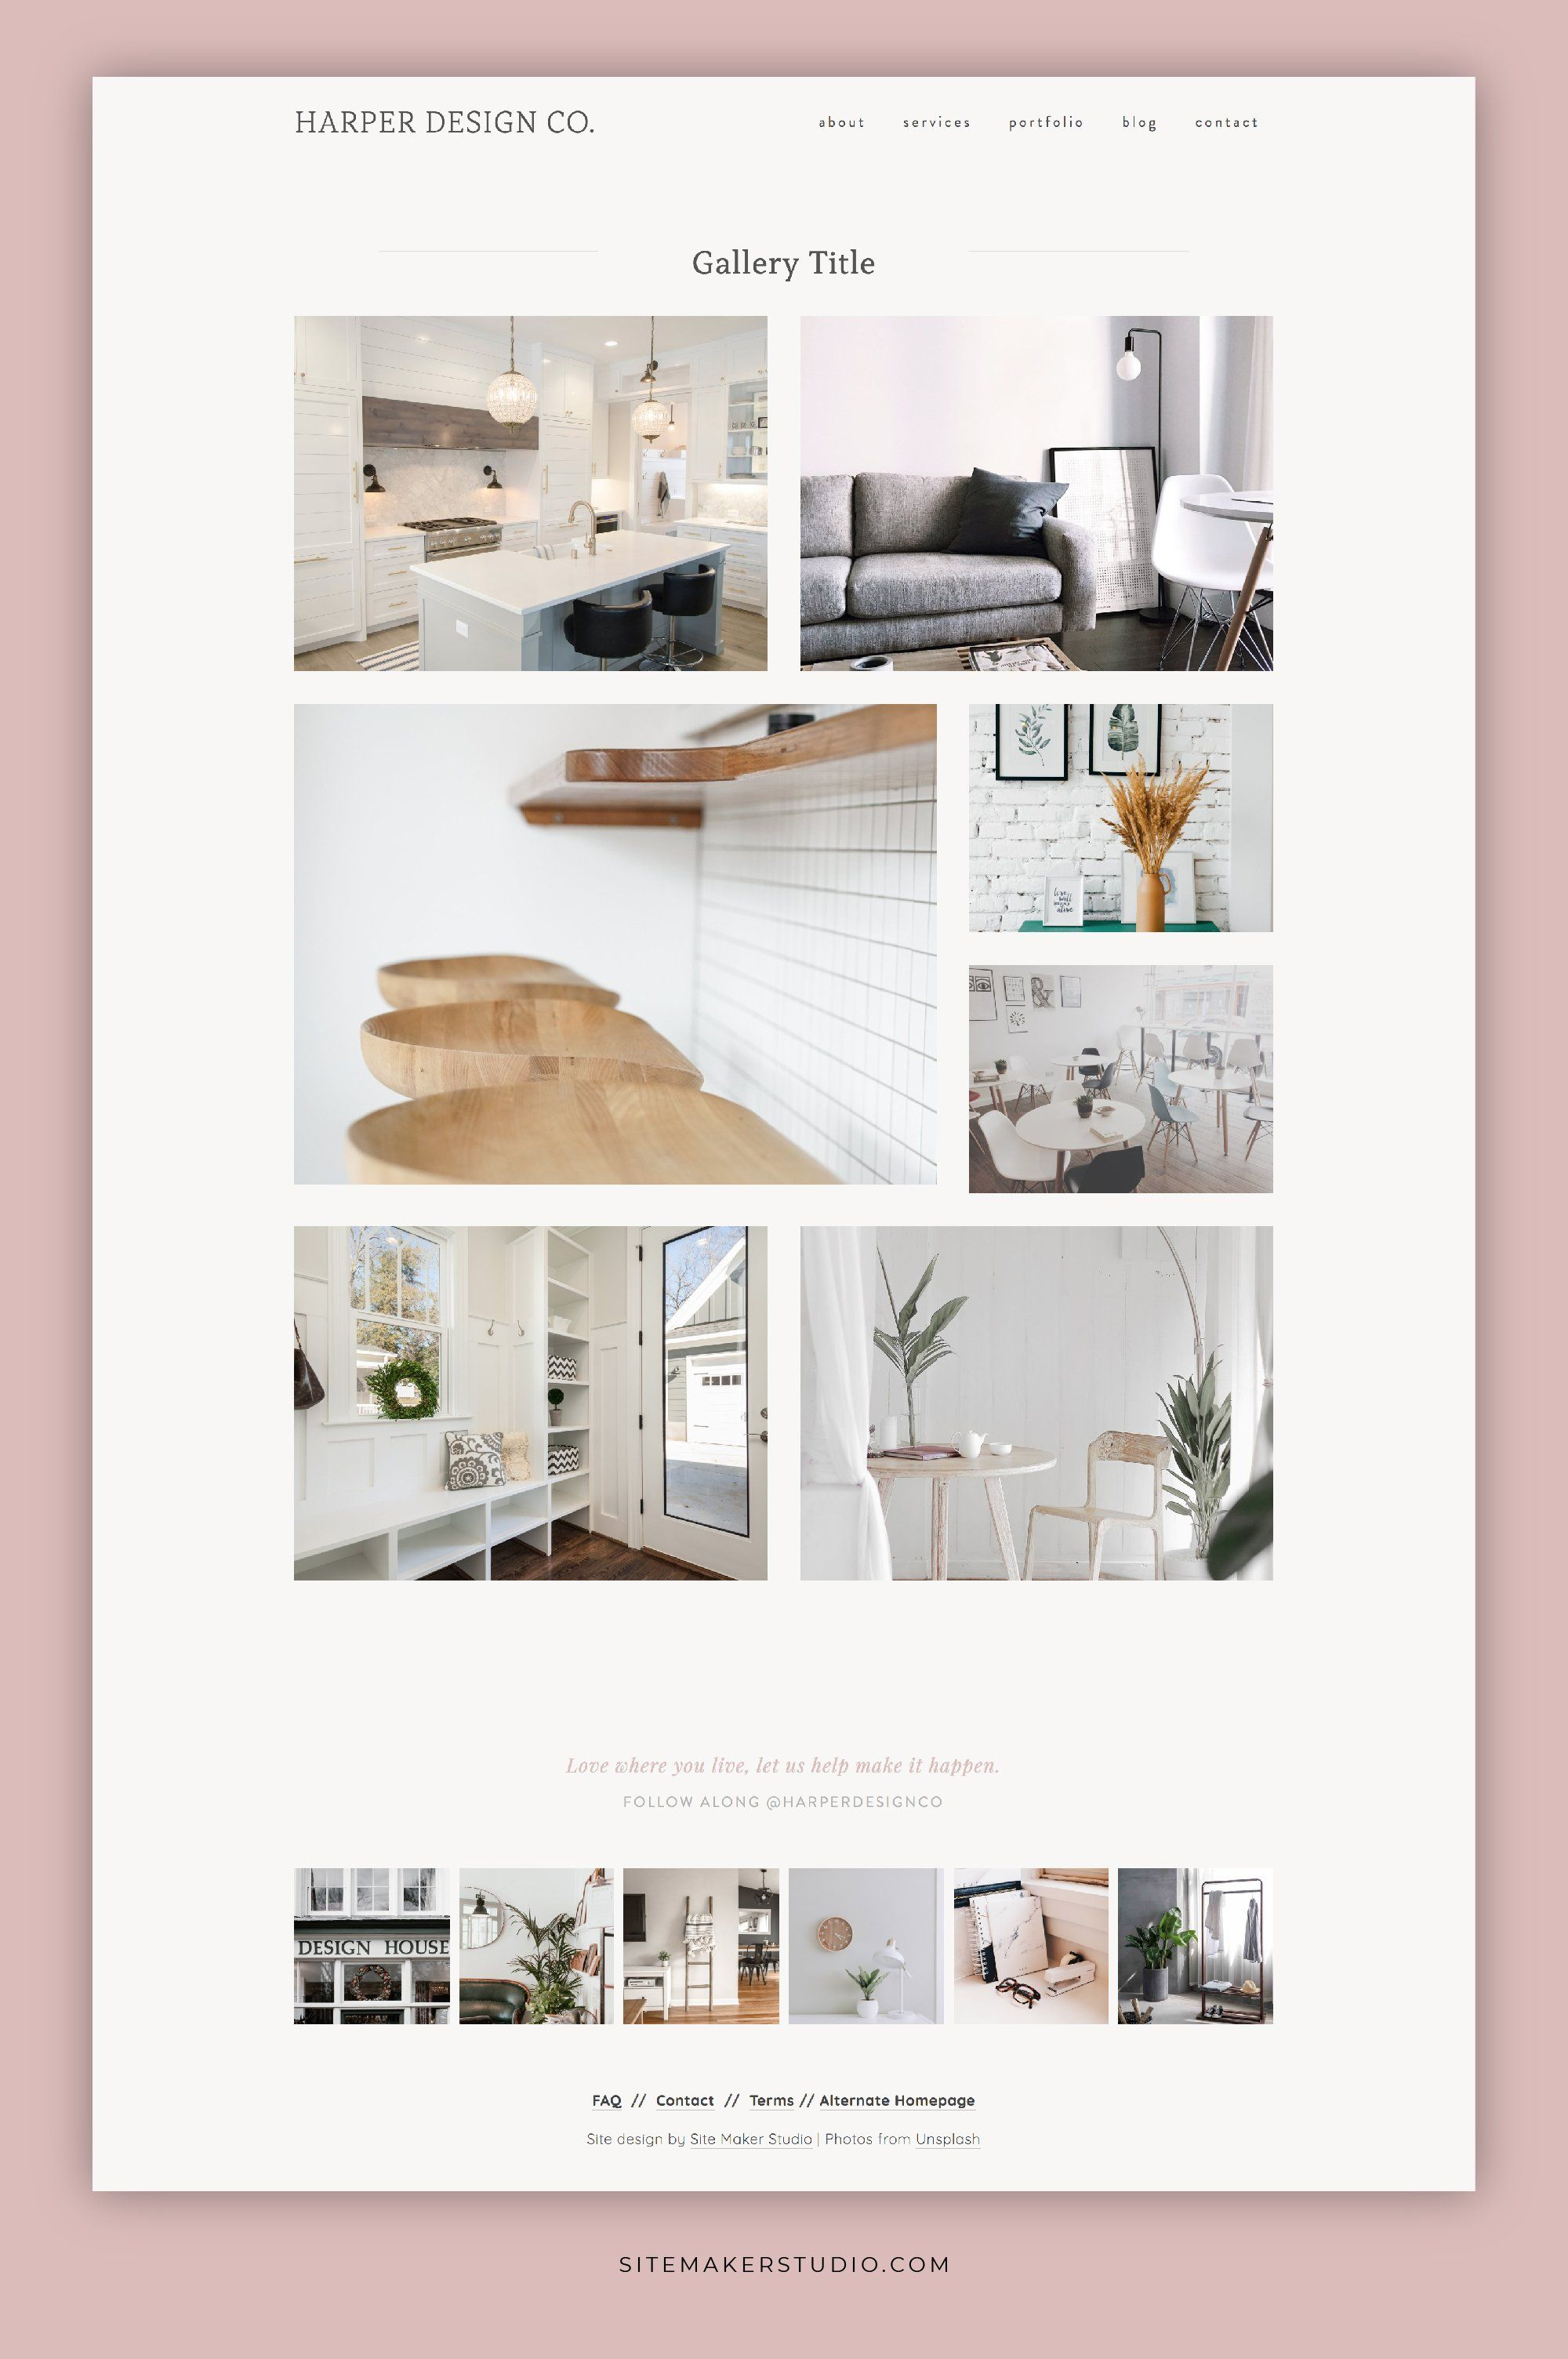 Harper Design Co With Images Interior Design Website